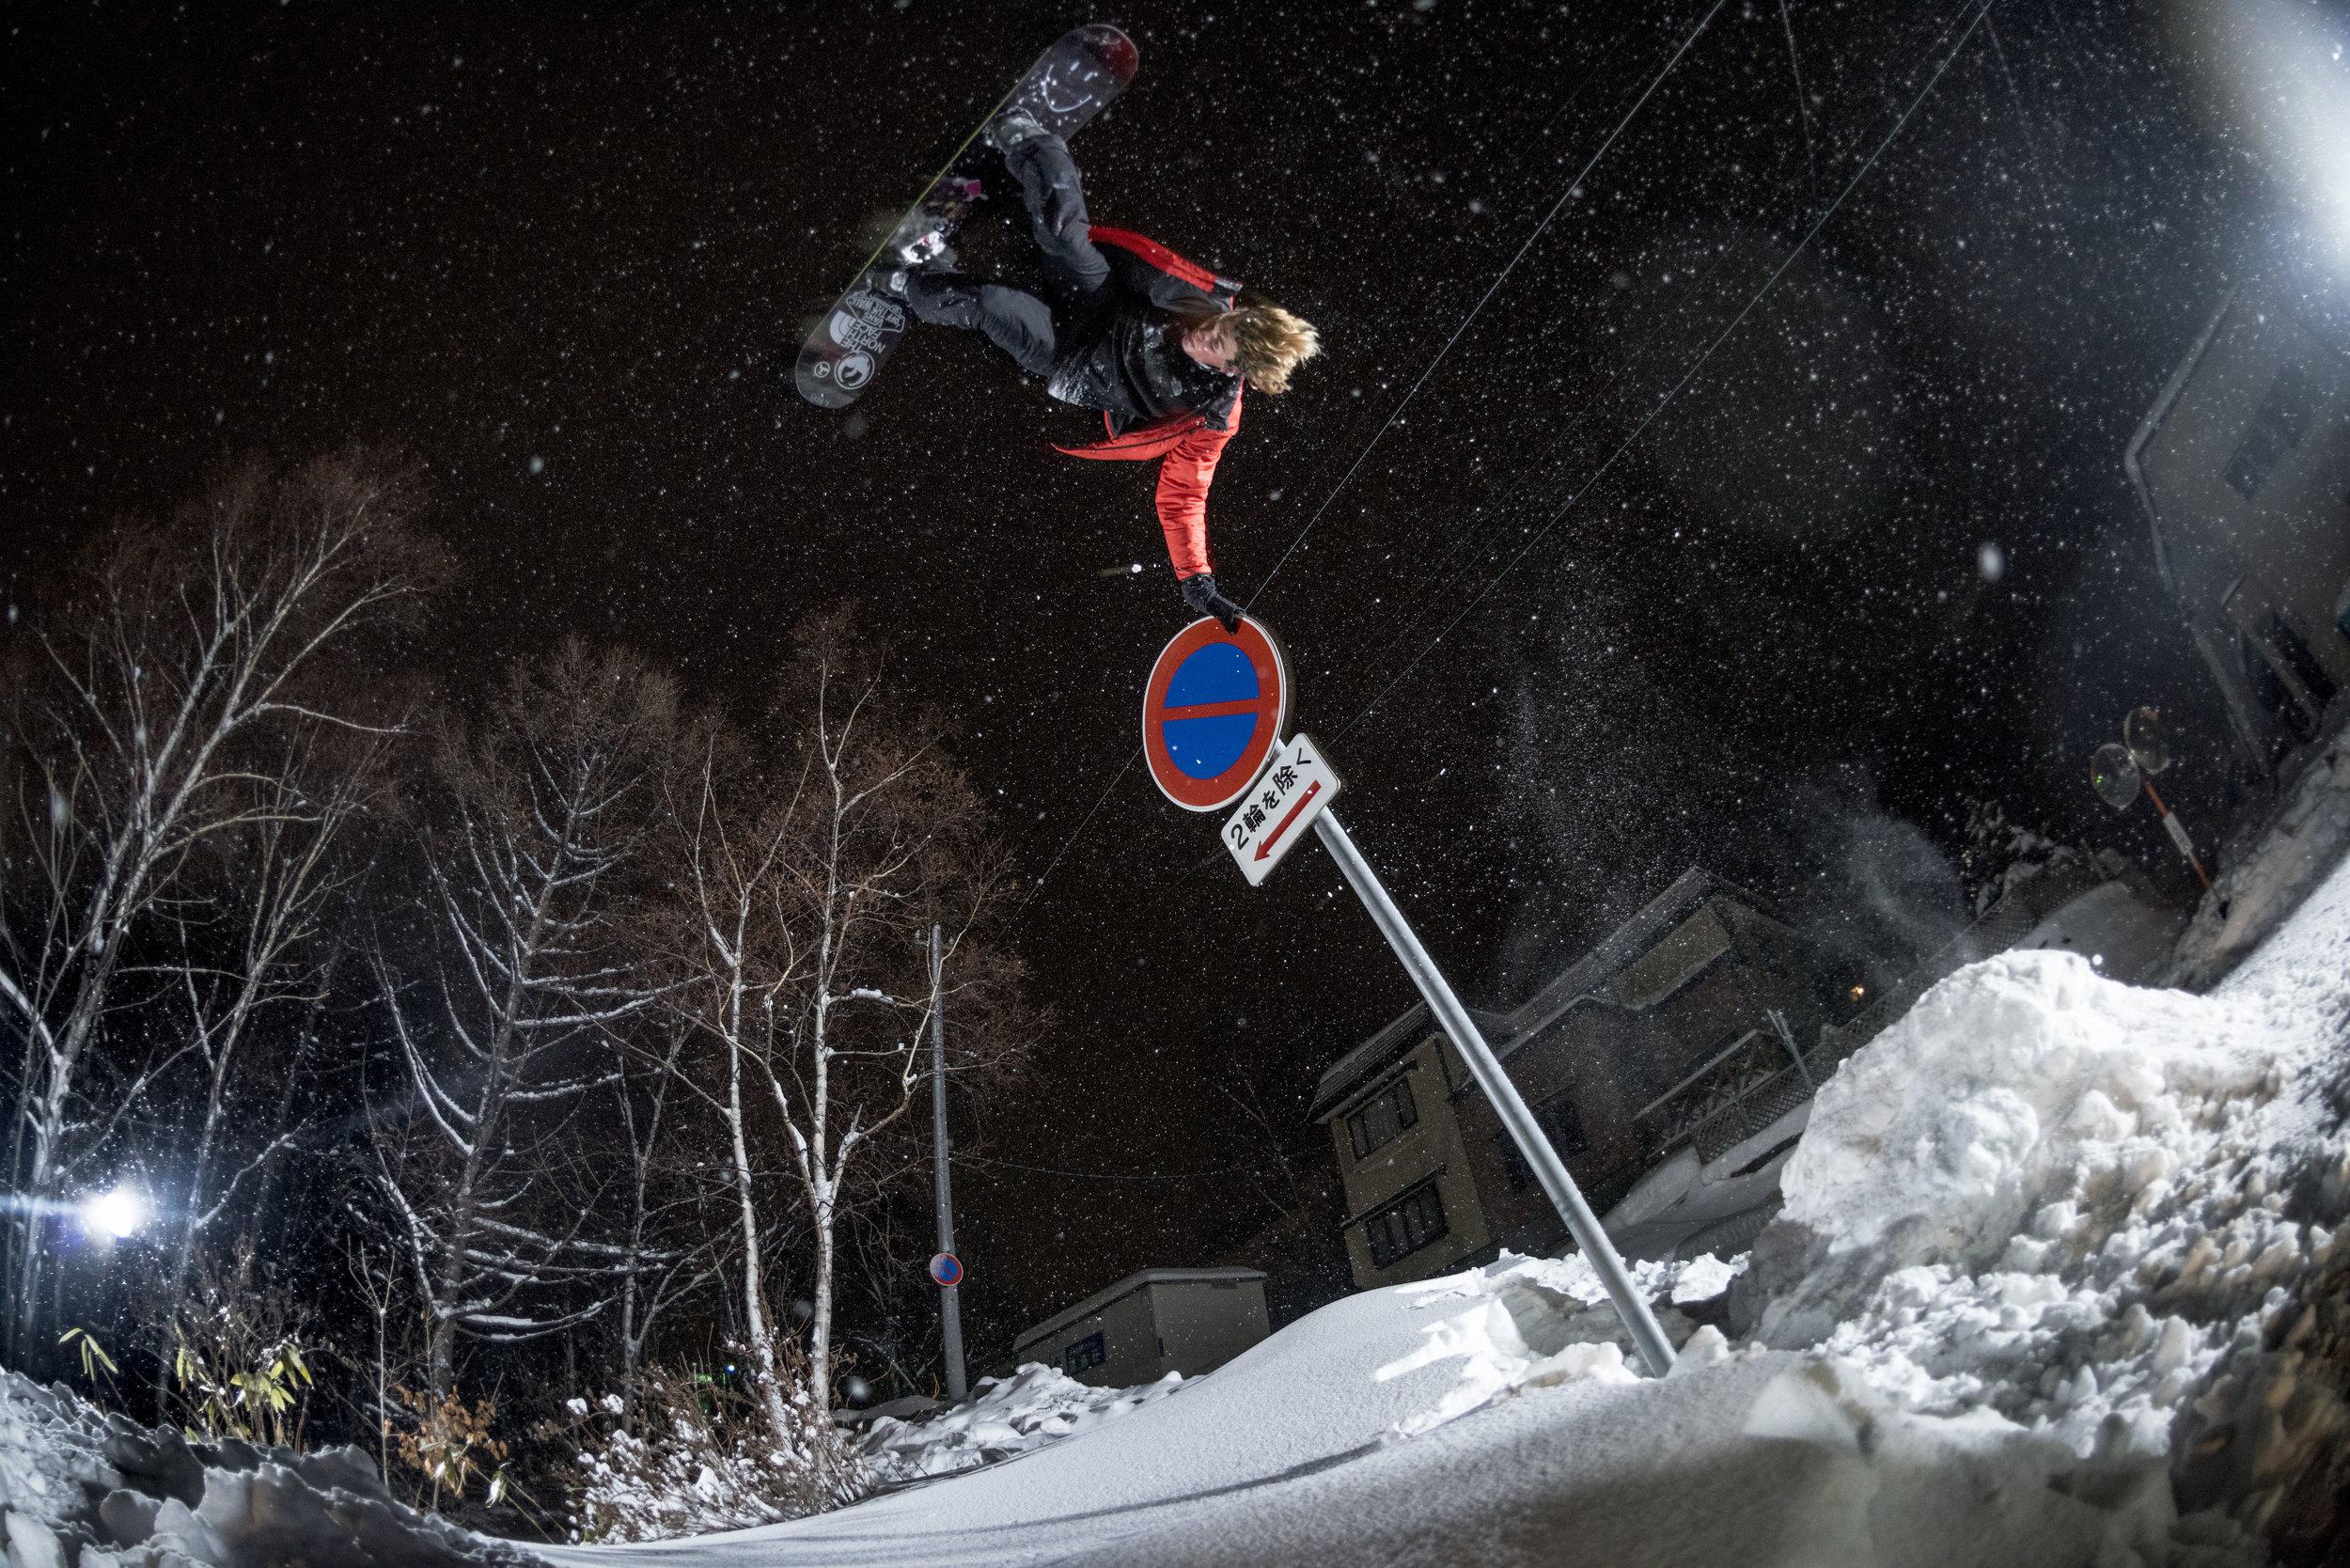 Blake Paul, Hokkaido, Japan. Photography by Tim Kemple.